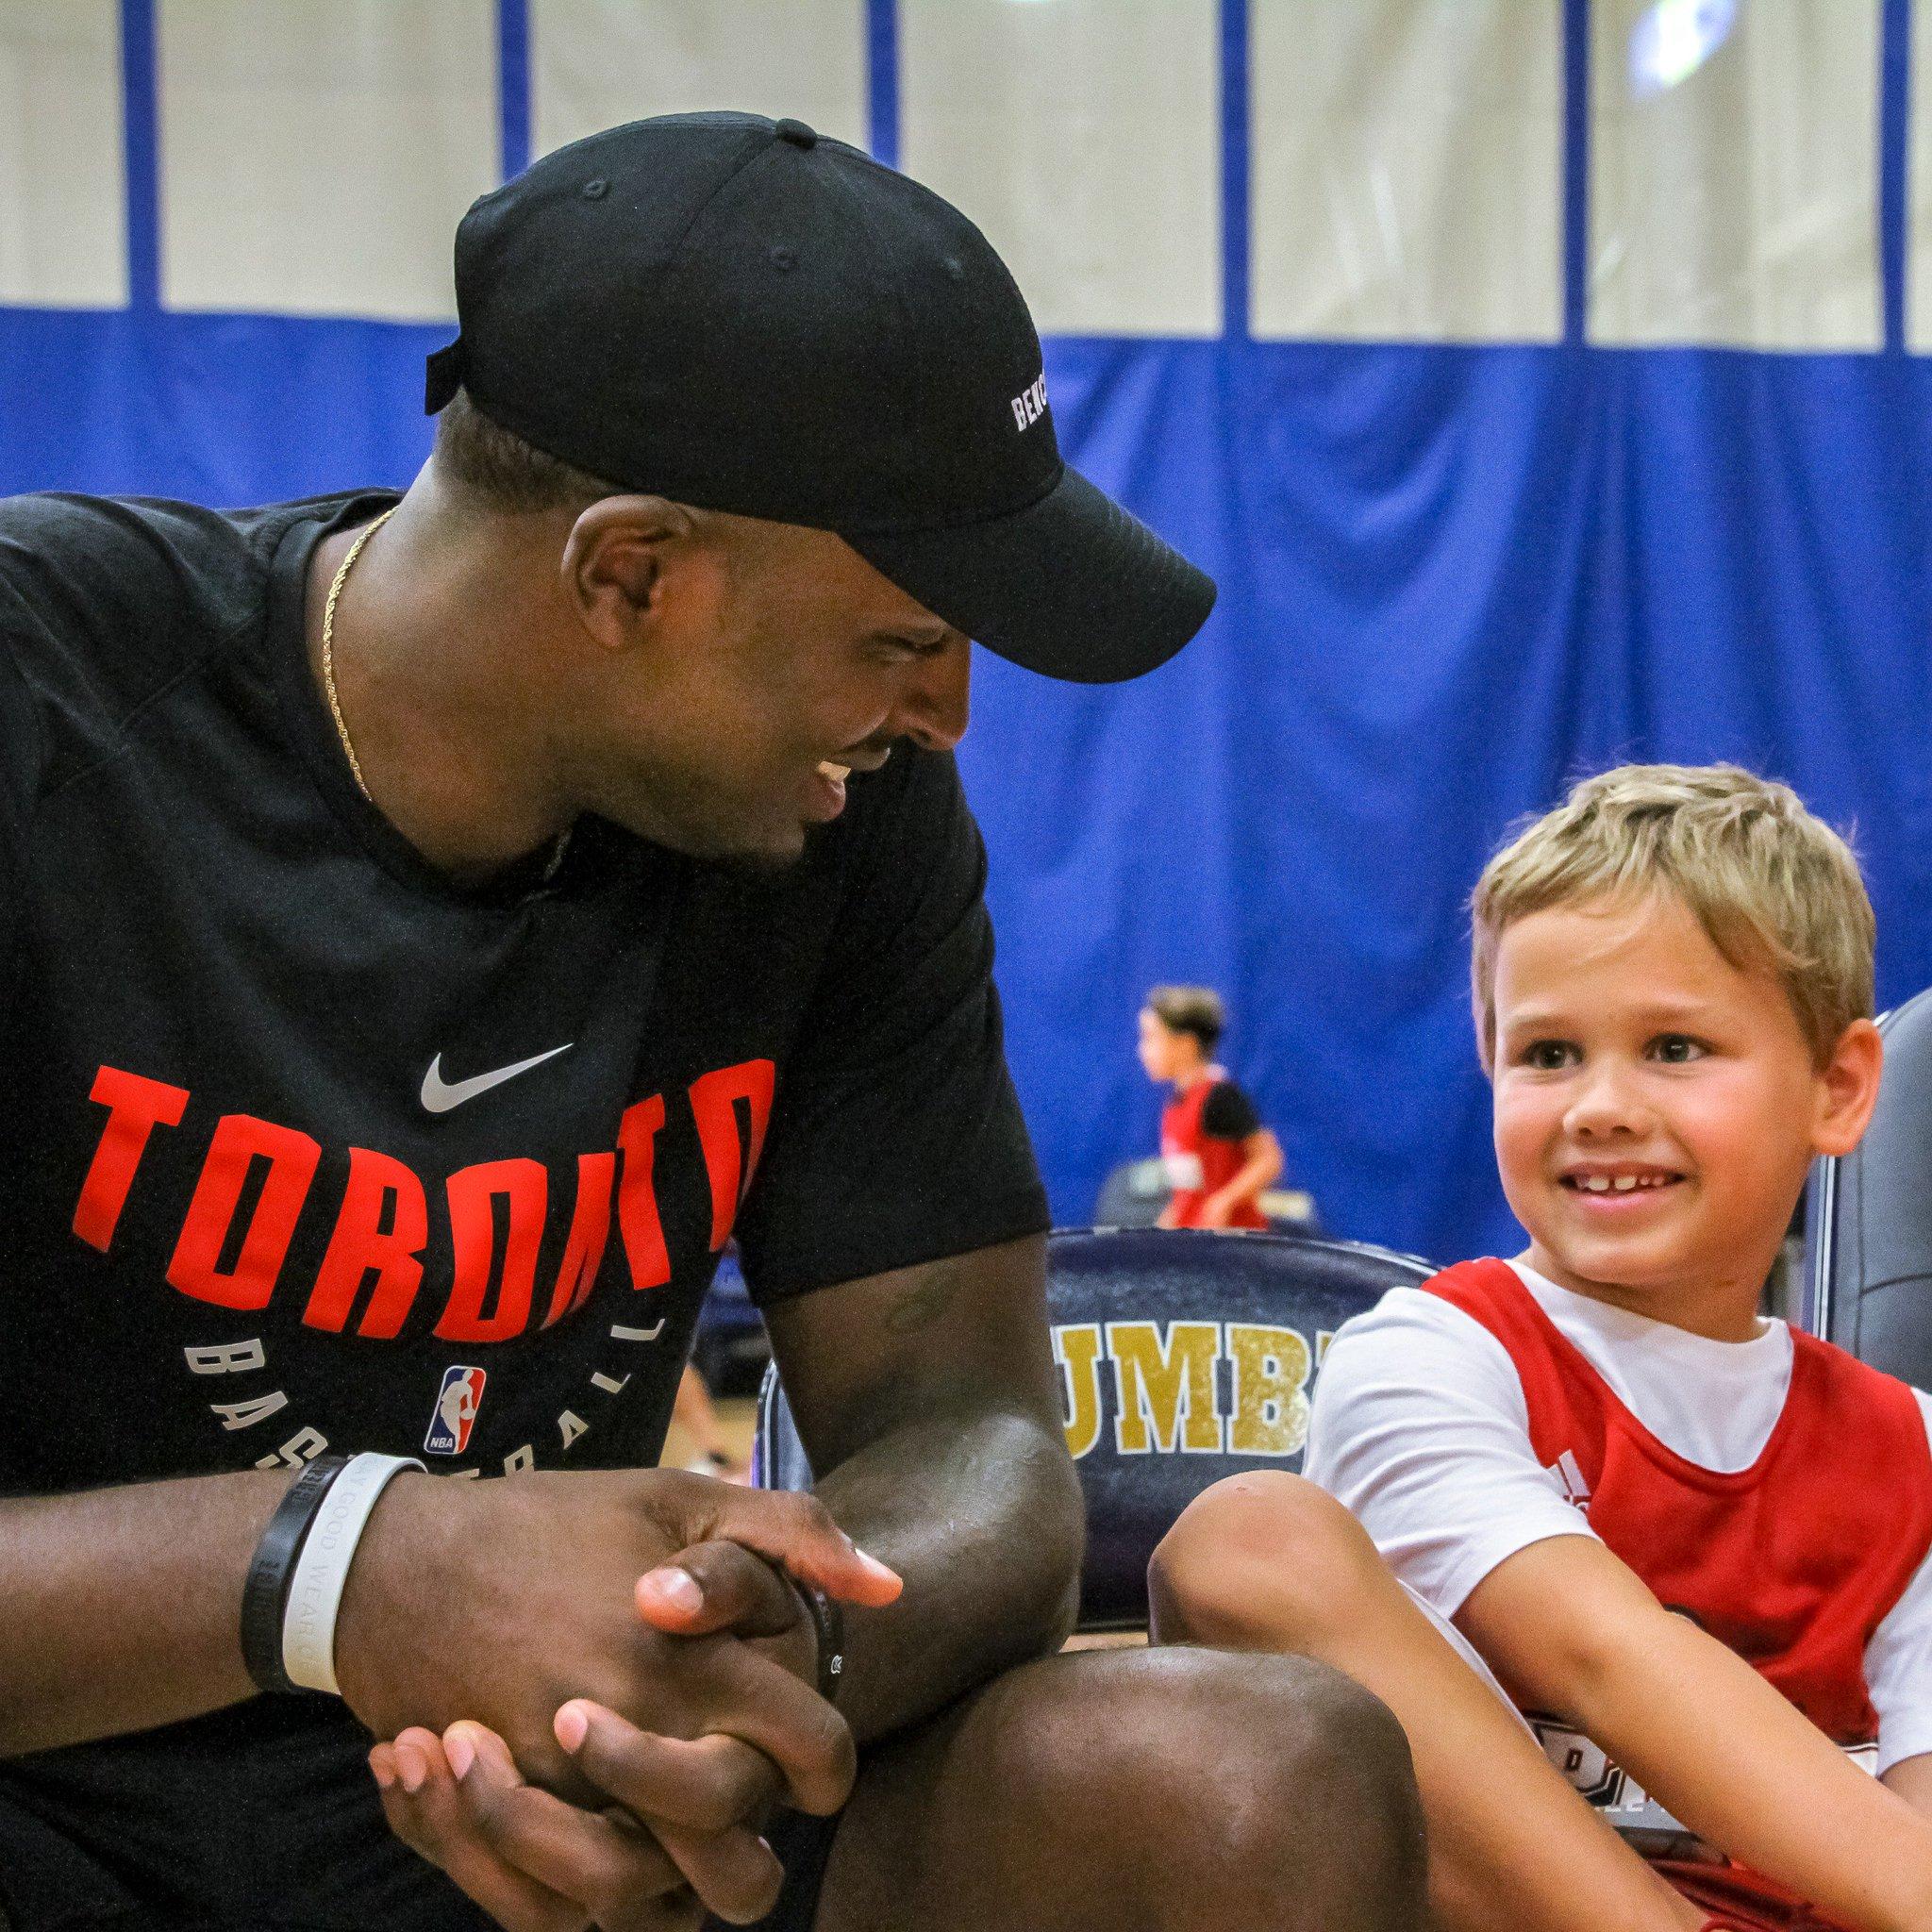 Fun was had today at Raptors Basketball Academy. #WeTheNorth https://t.co/XARo8nIdMG